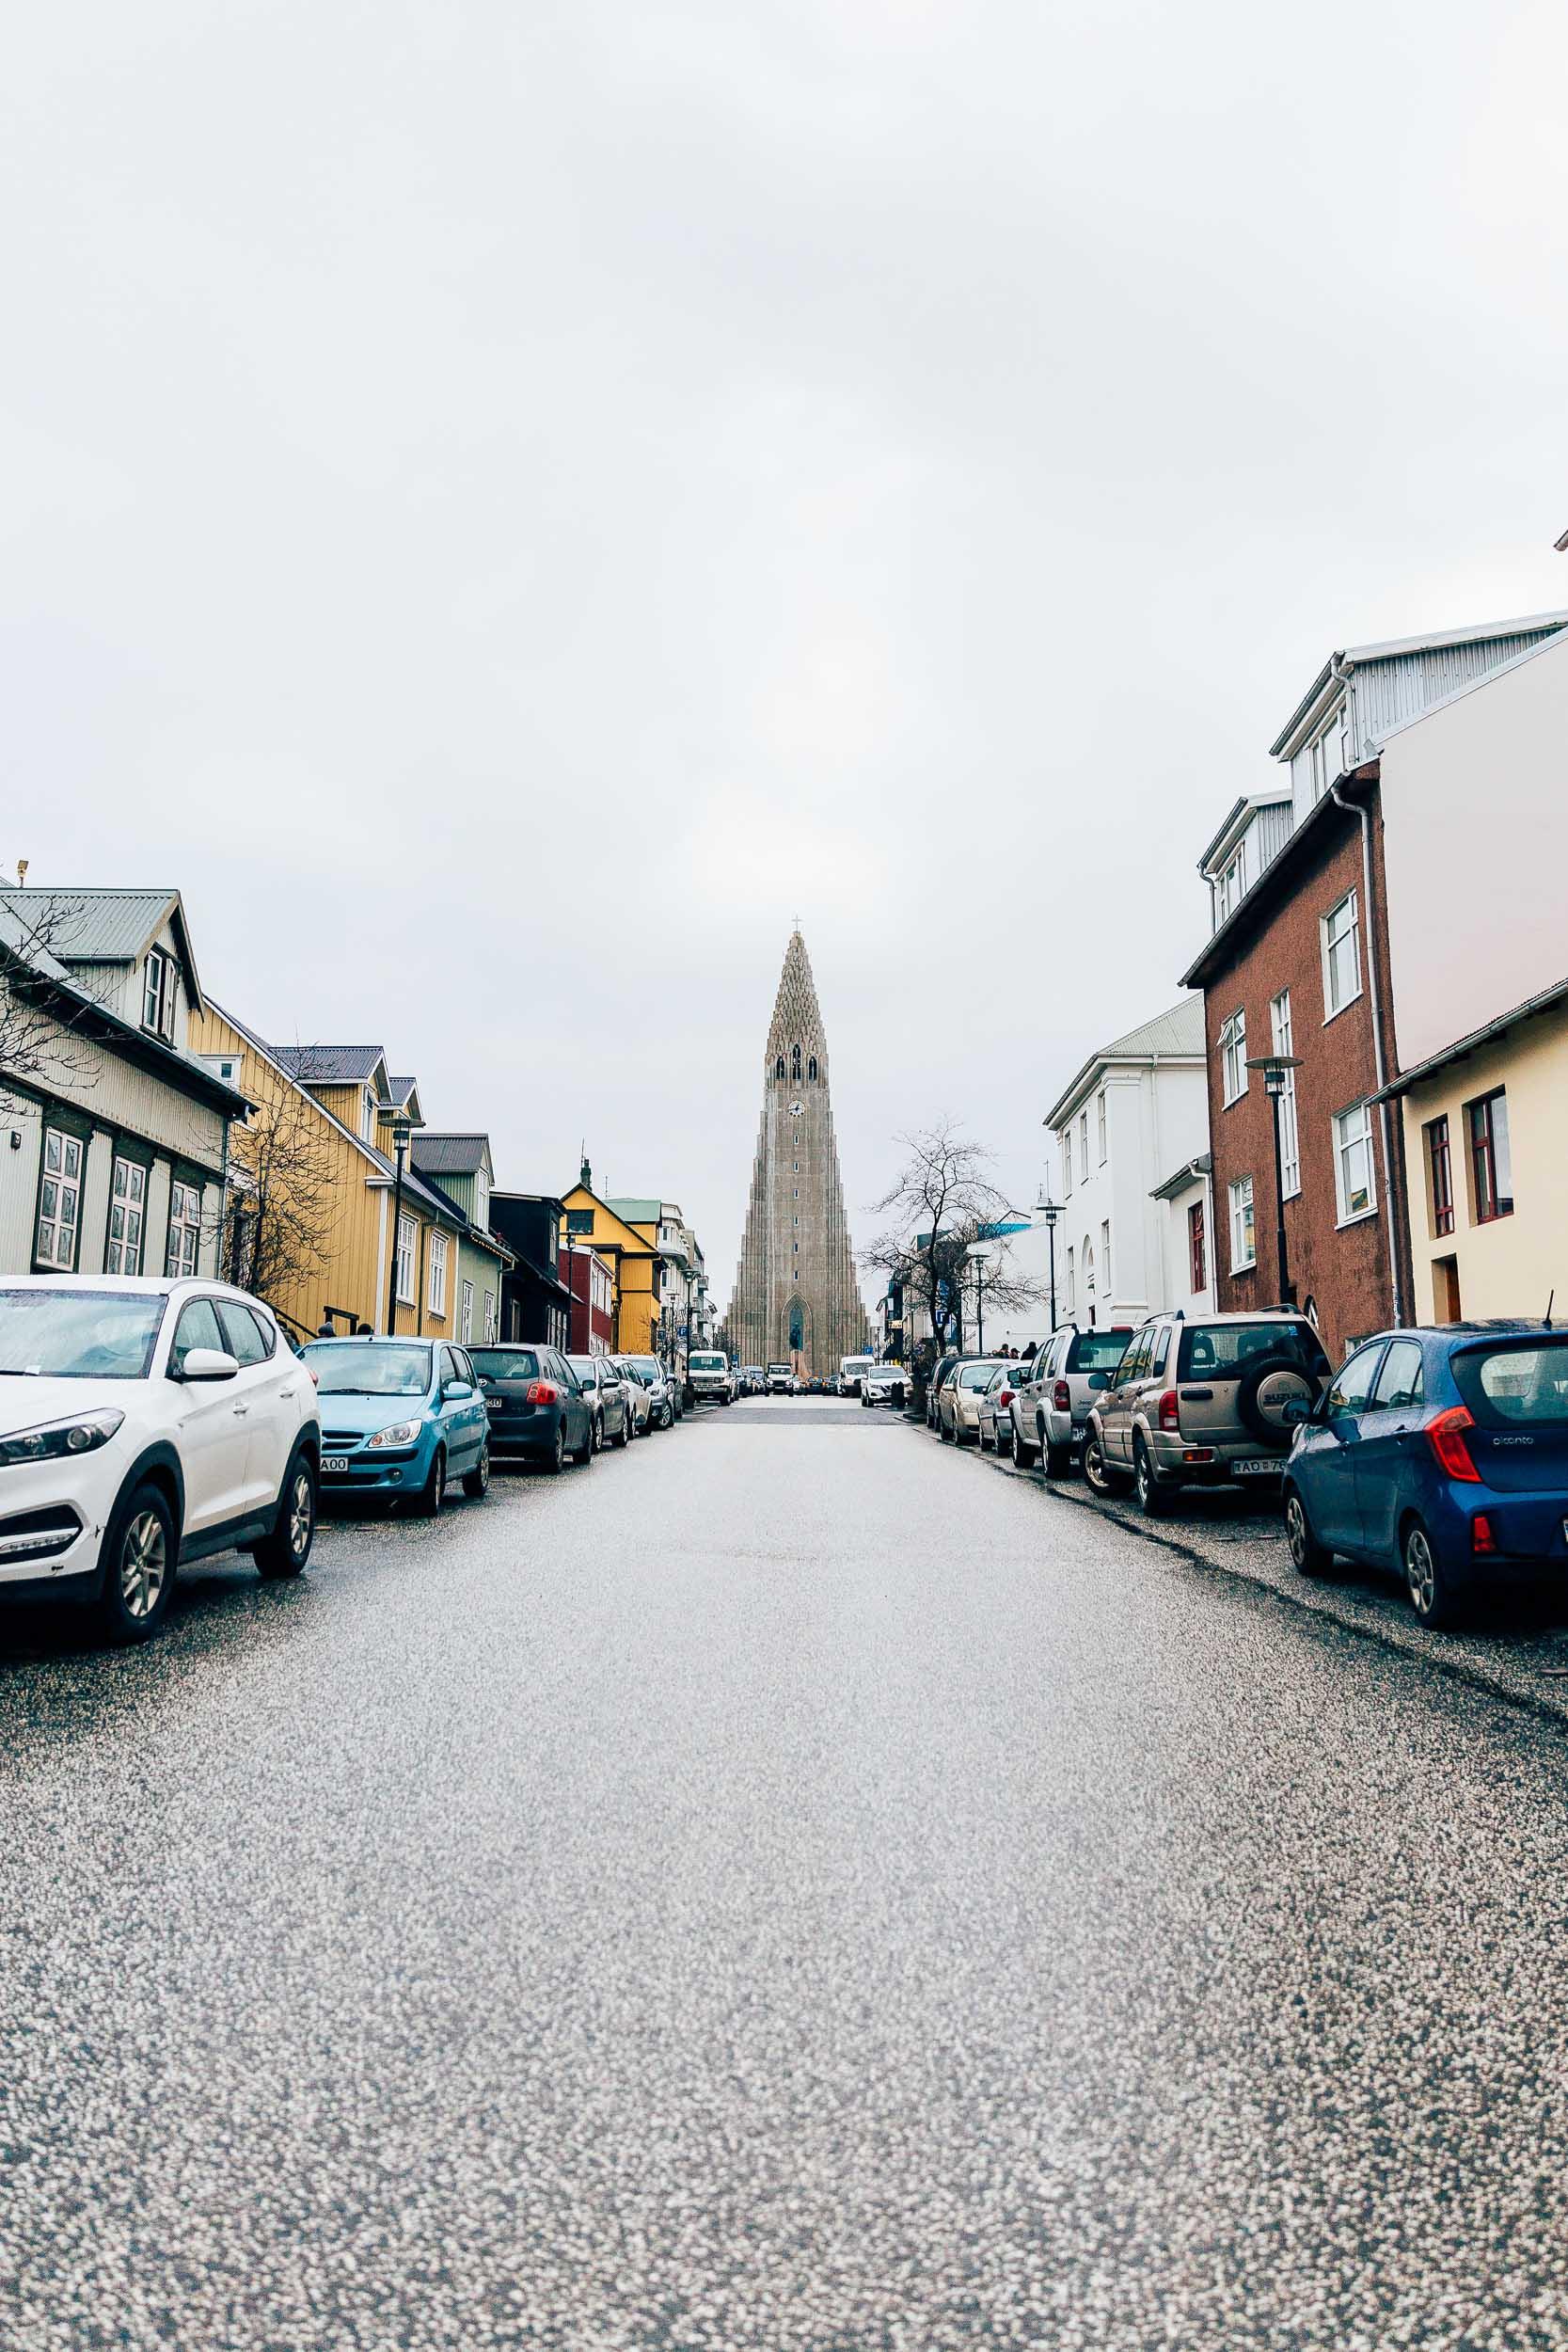 02_2019_Iceland-65.jpg